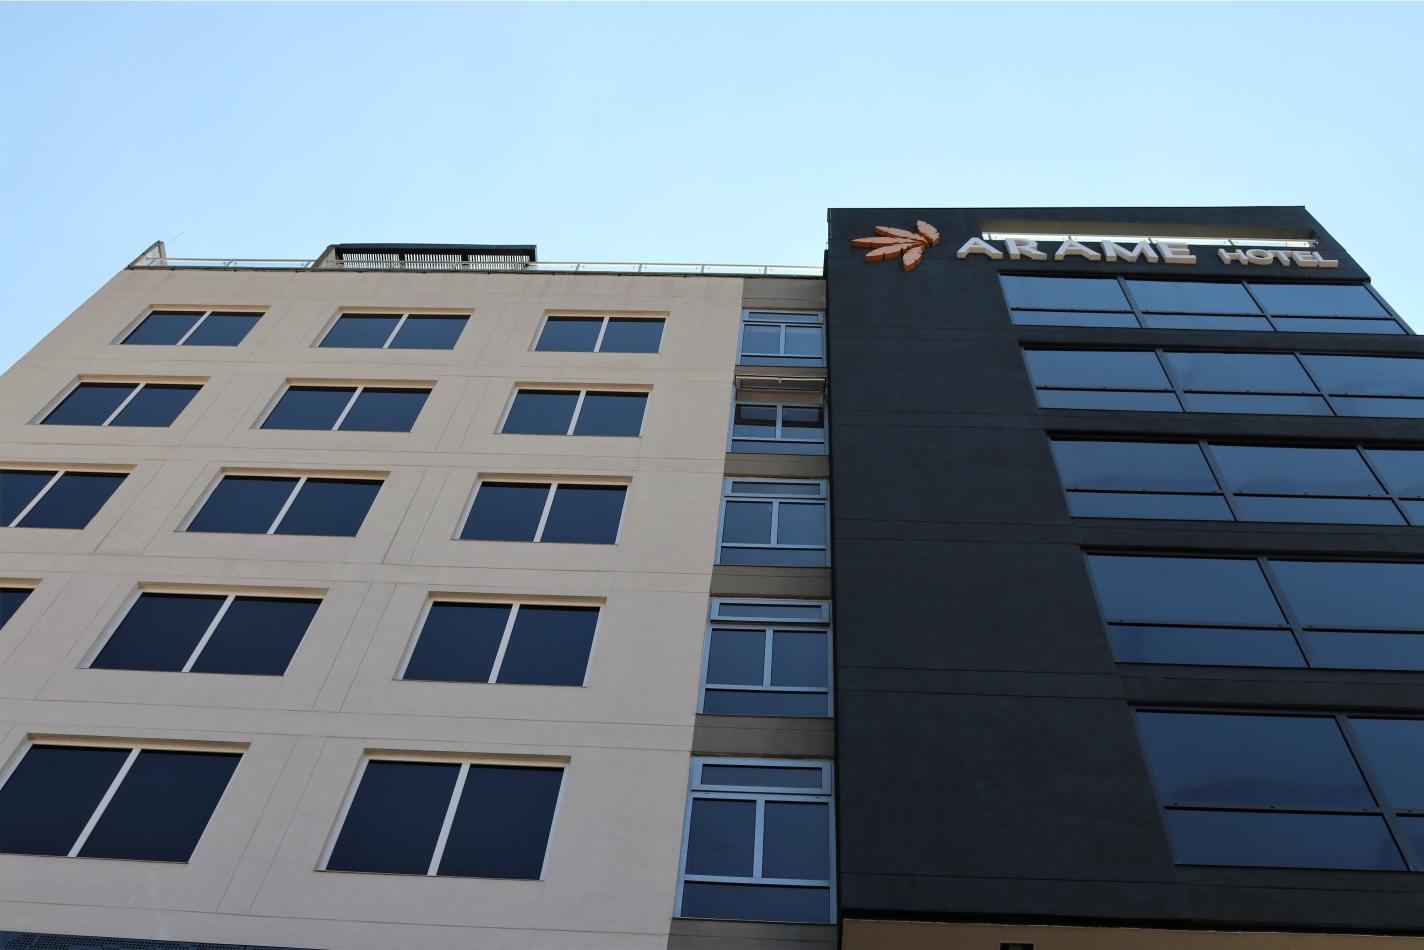 IM 1 Galeria Hotel Arame